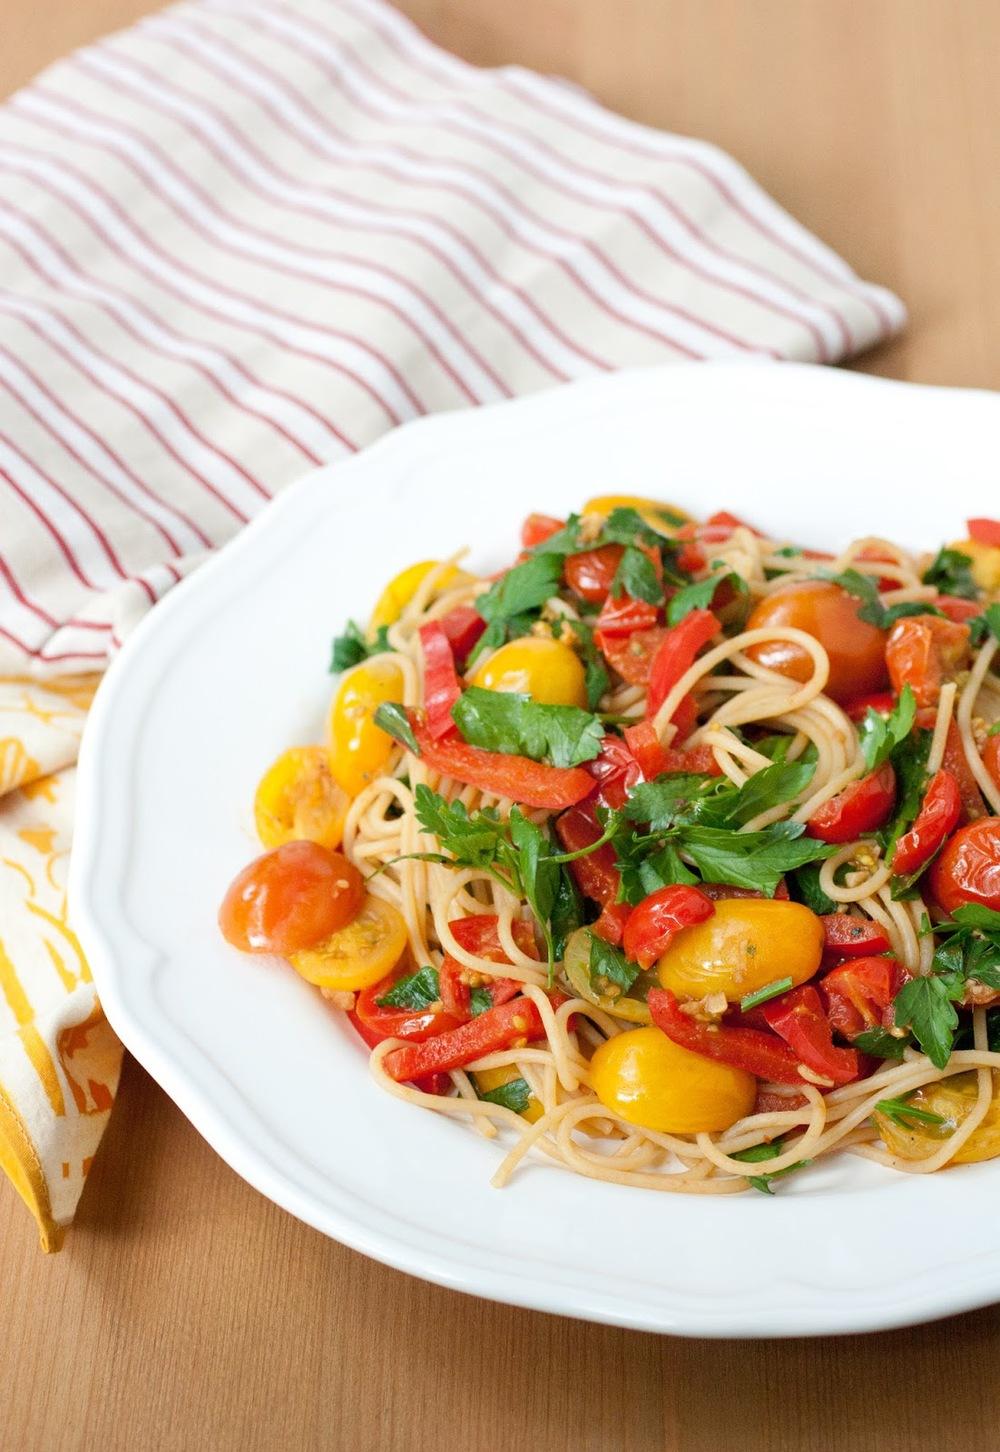 Tomato-Anchovy-Spaghetti-1.jpg